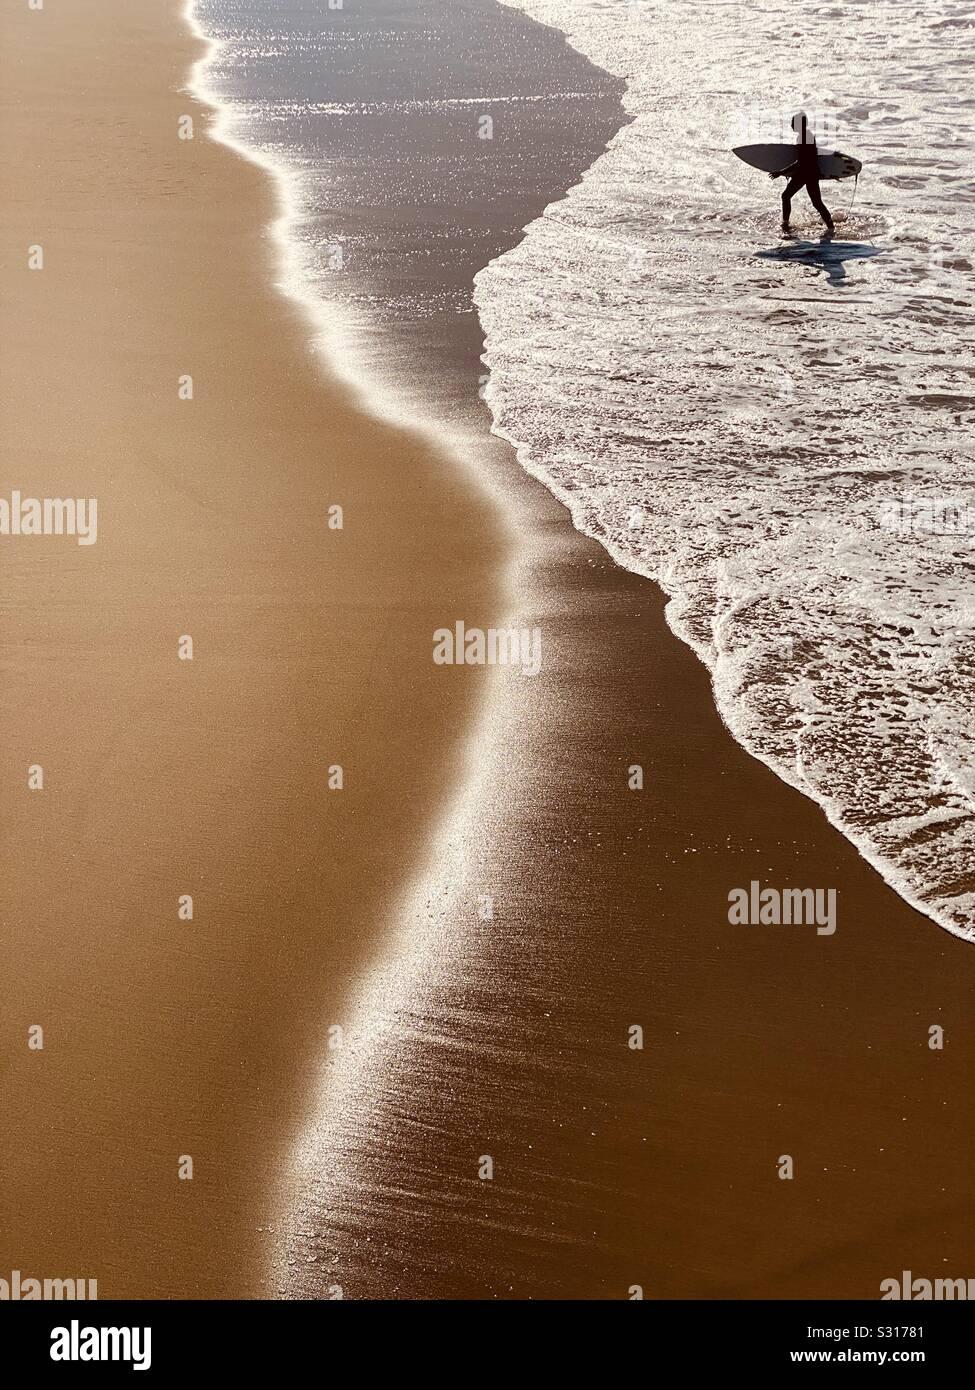 Surfer al salir del agua después de navegar. Manhattan Beach, California, USA. Foto de stock